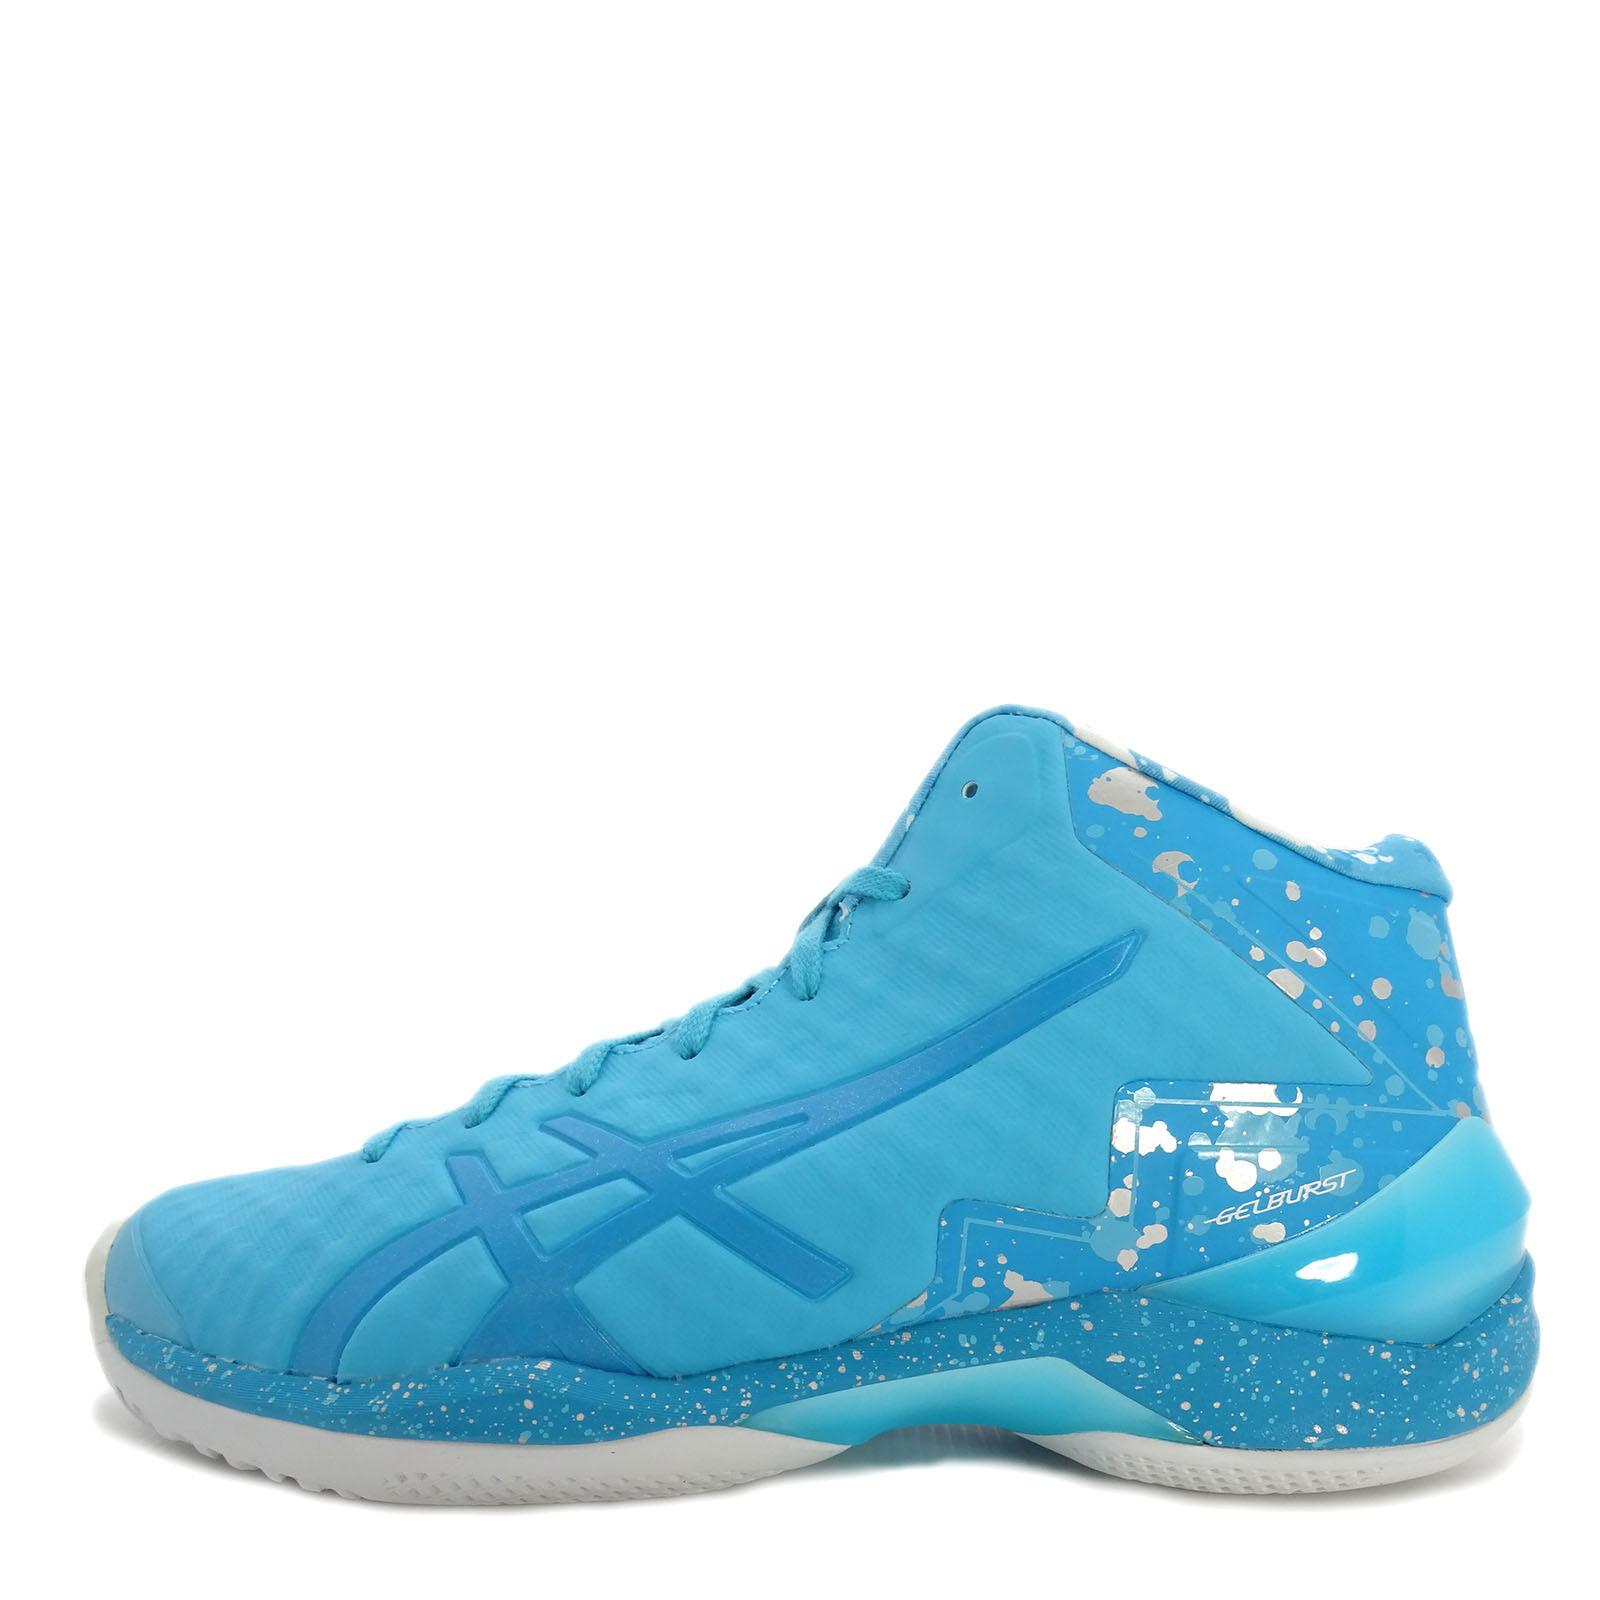 Asics GELBurst 21 GE [TBF30G-3941] Men Basketball Shoes Aqua/Island Blue-White